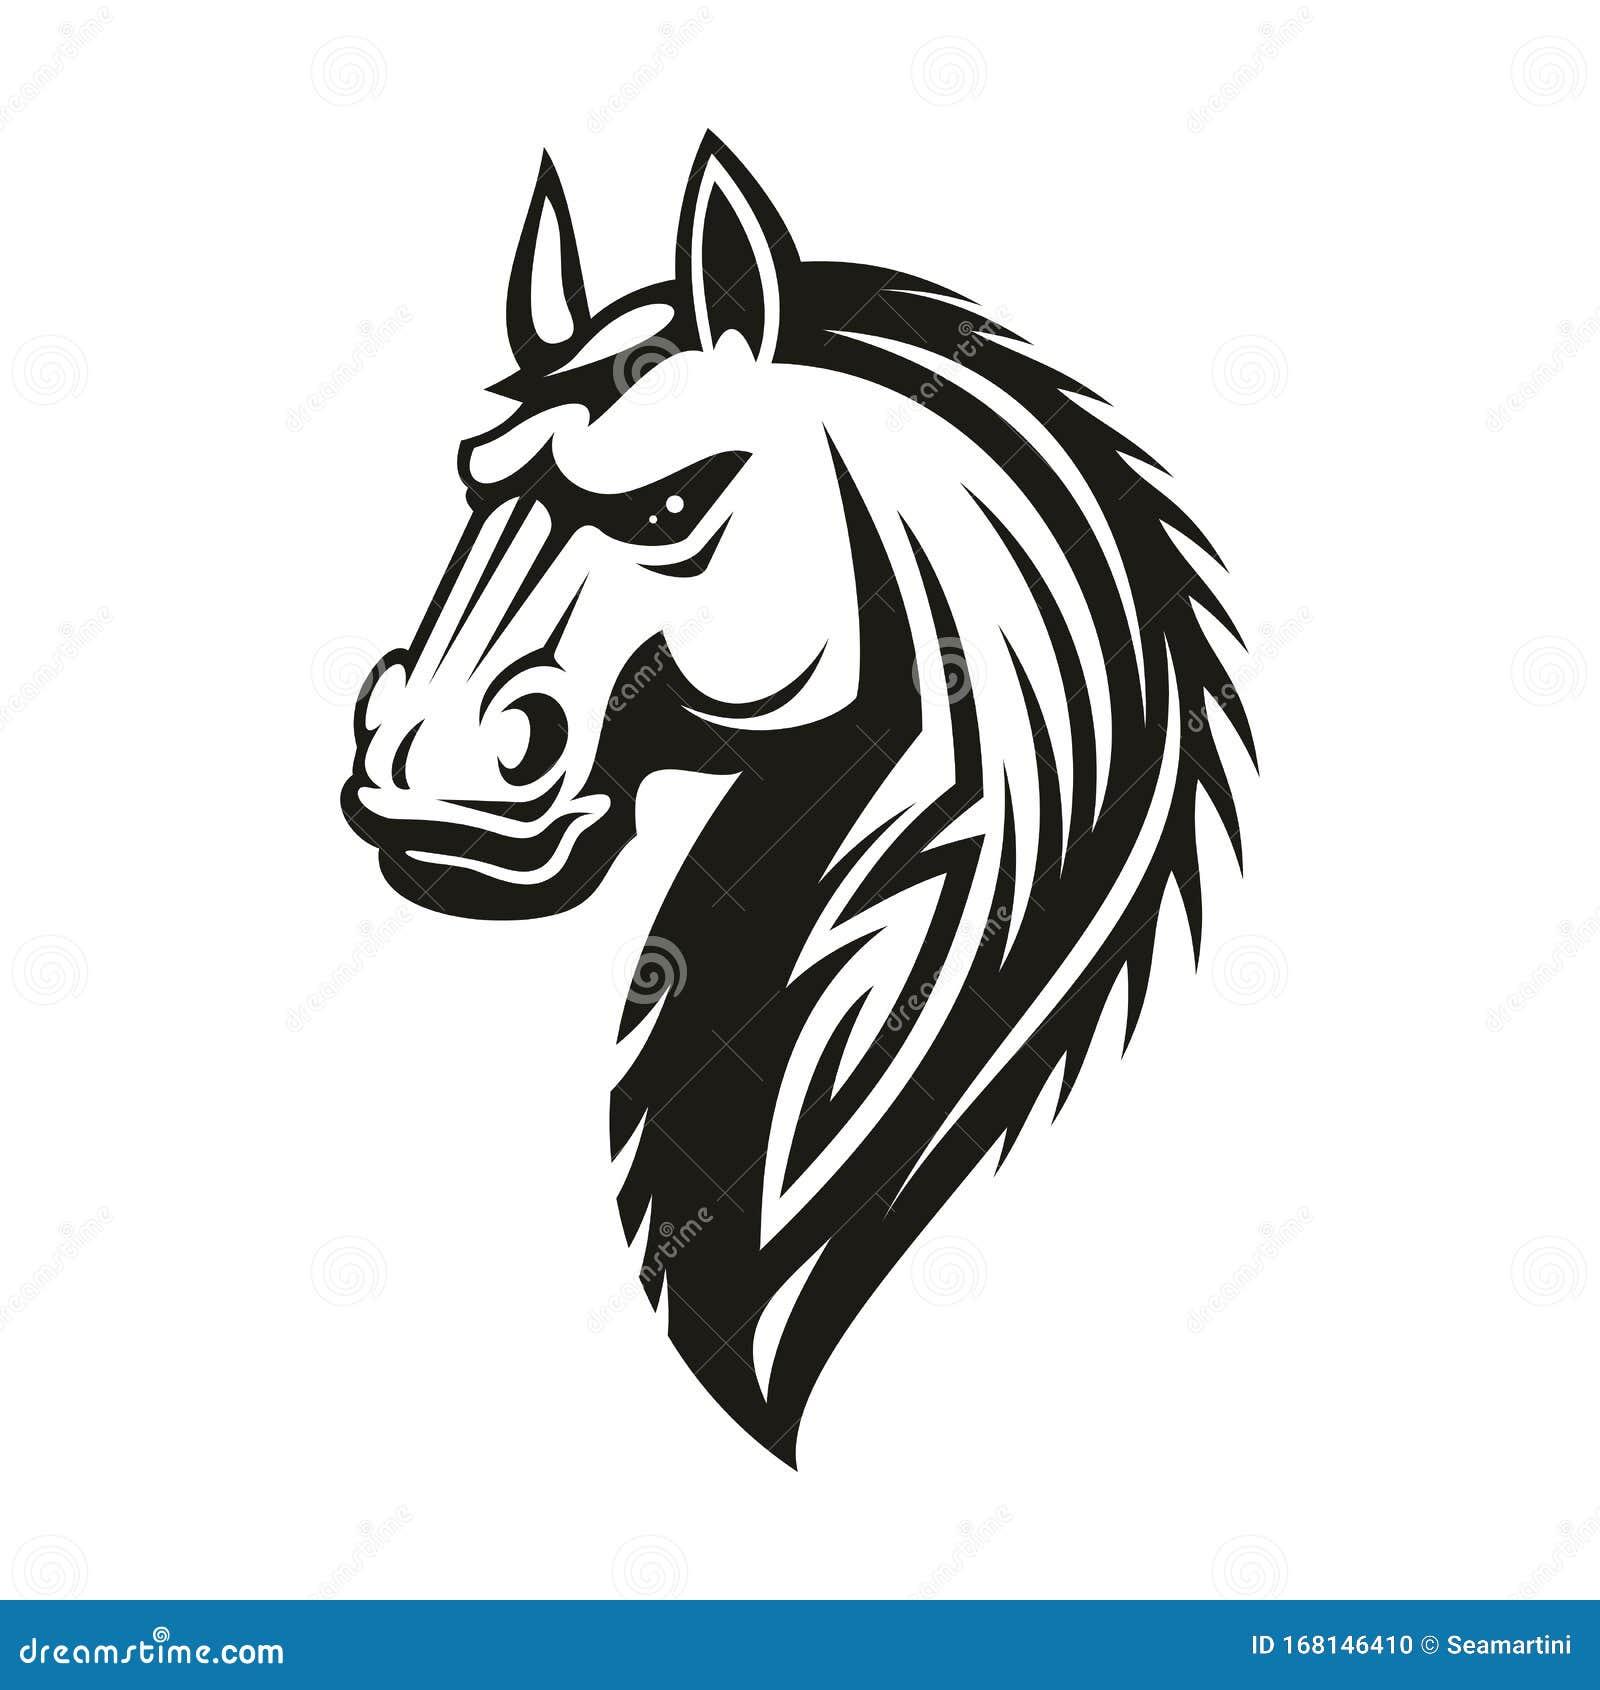 Tribal Horse Head Mascot Or Tattoo Stock Vector Illustration Of Black Freedom 168146410